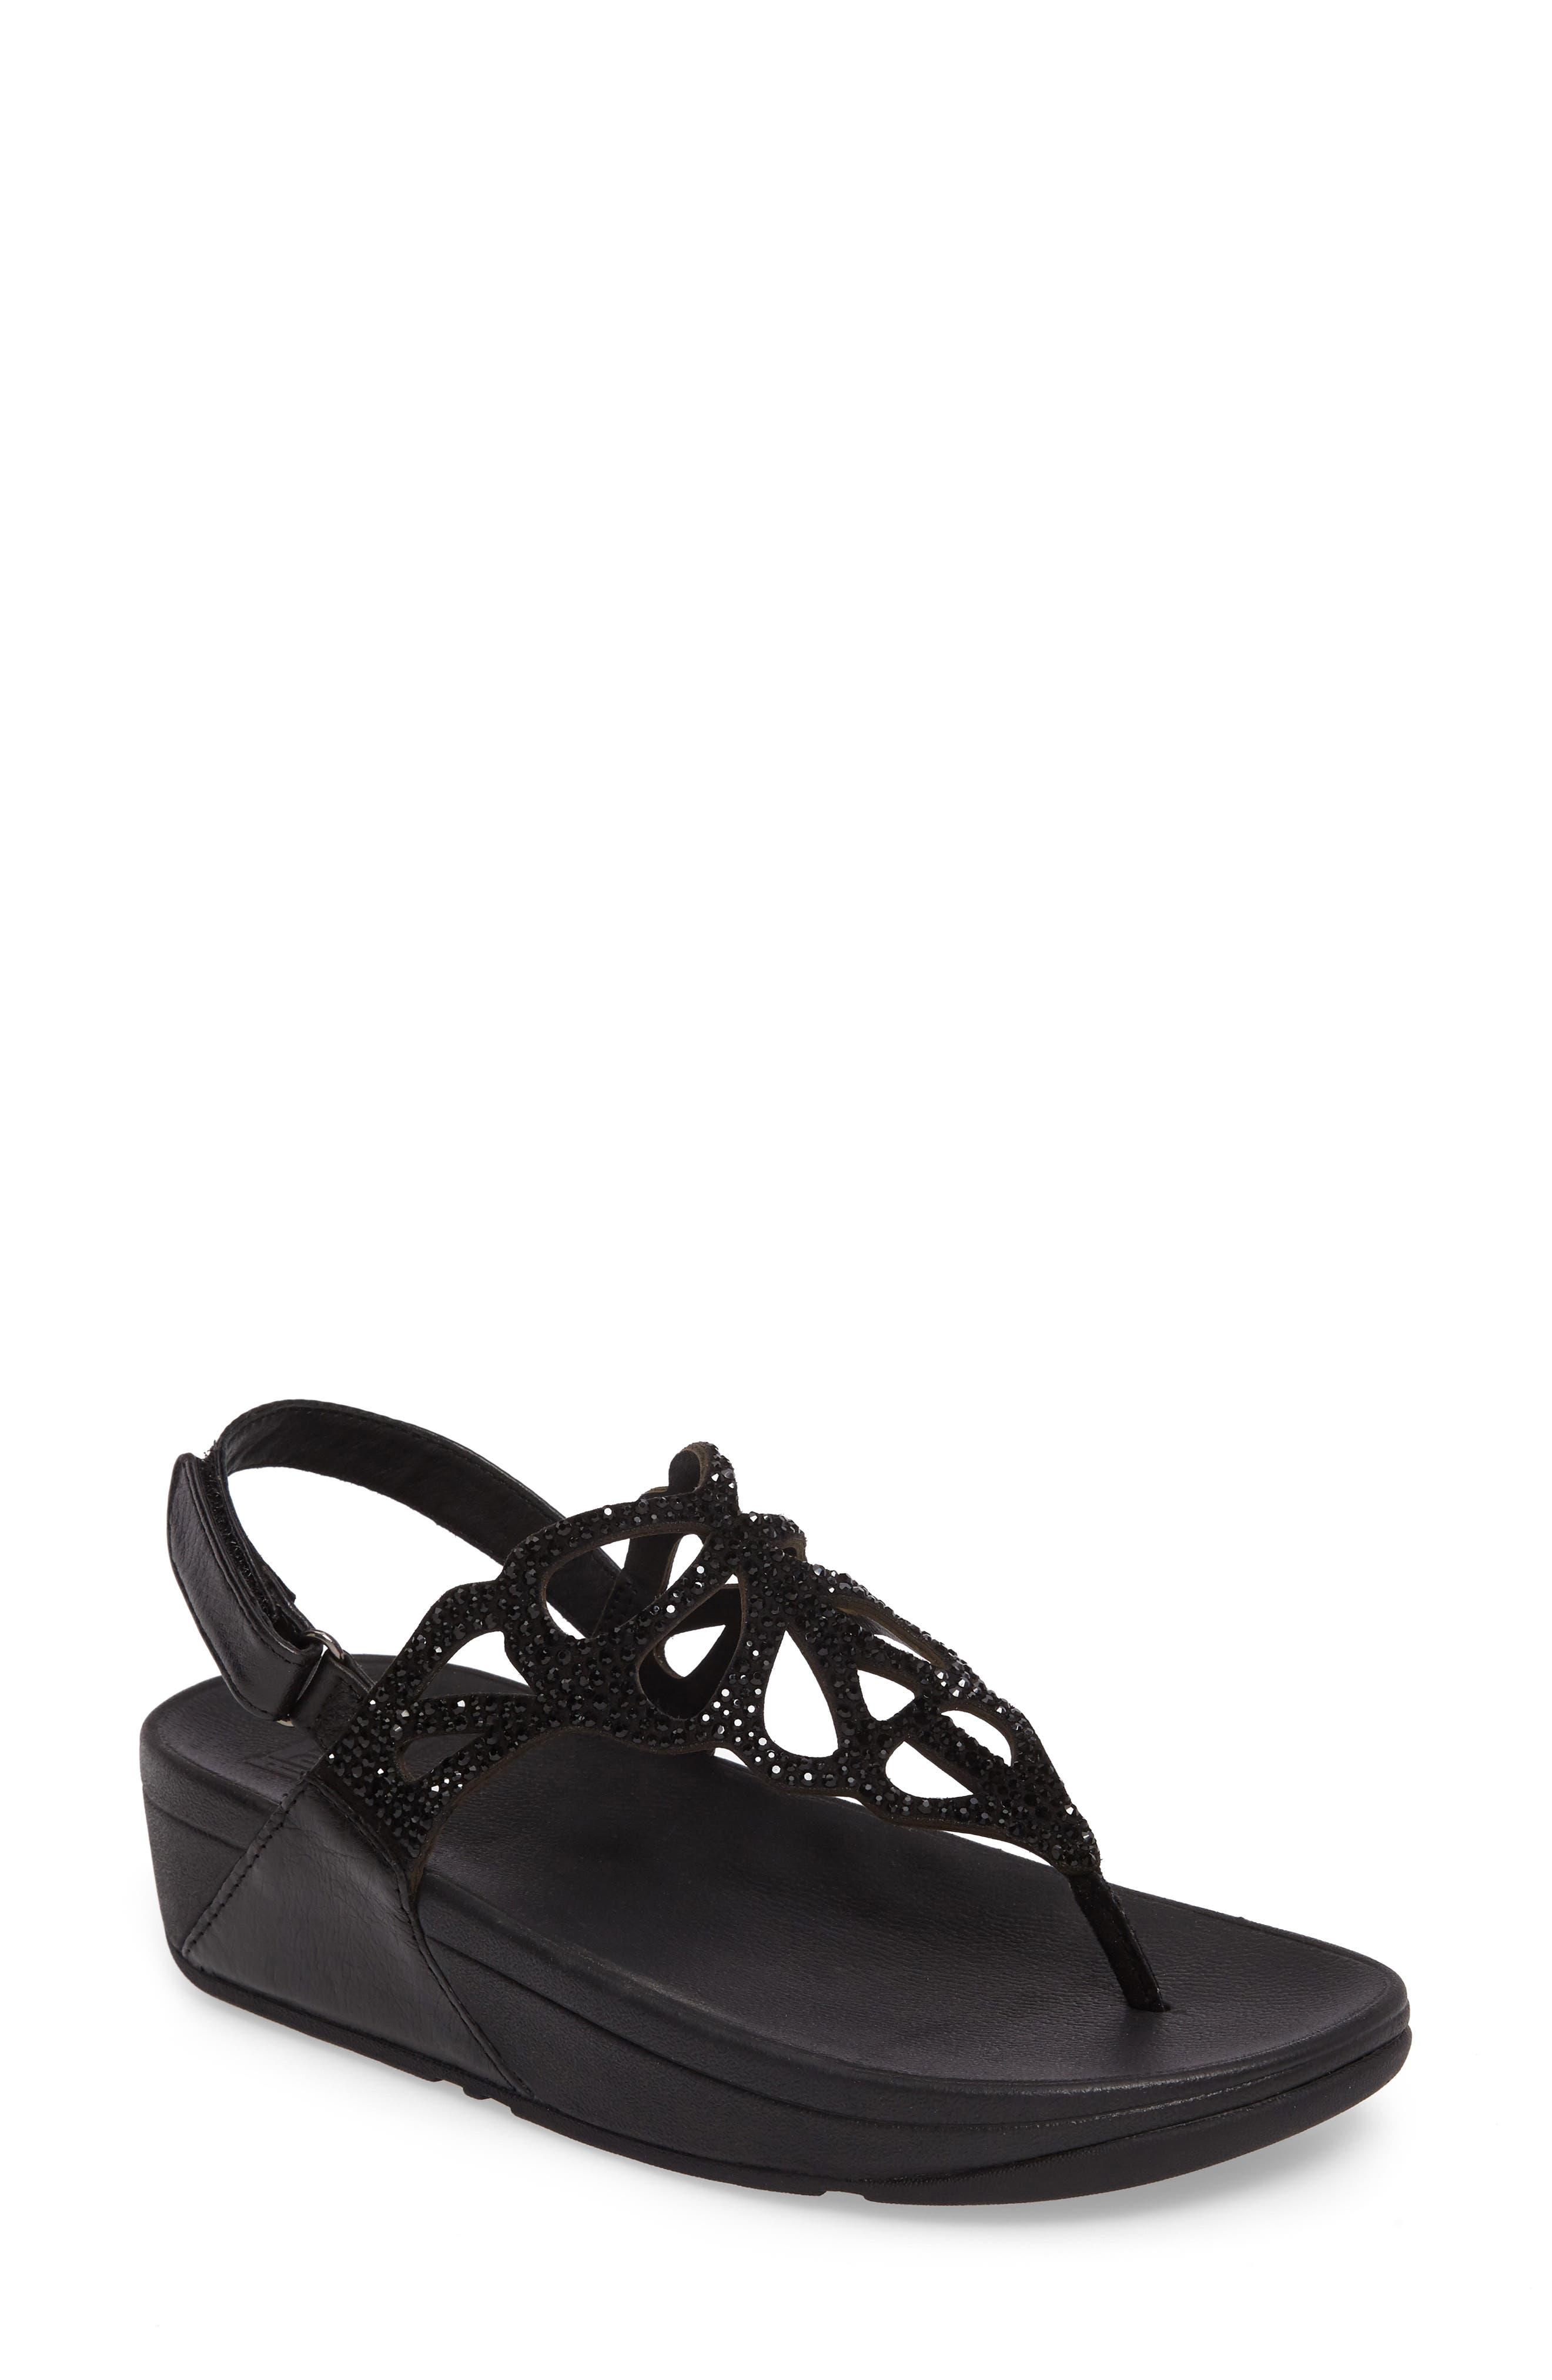 Bumble Crystal Embellished Sandal,                             Main thumbnail 1, color,                             Black Leather